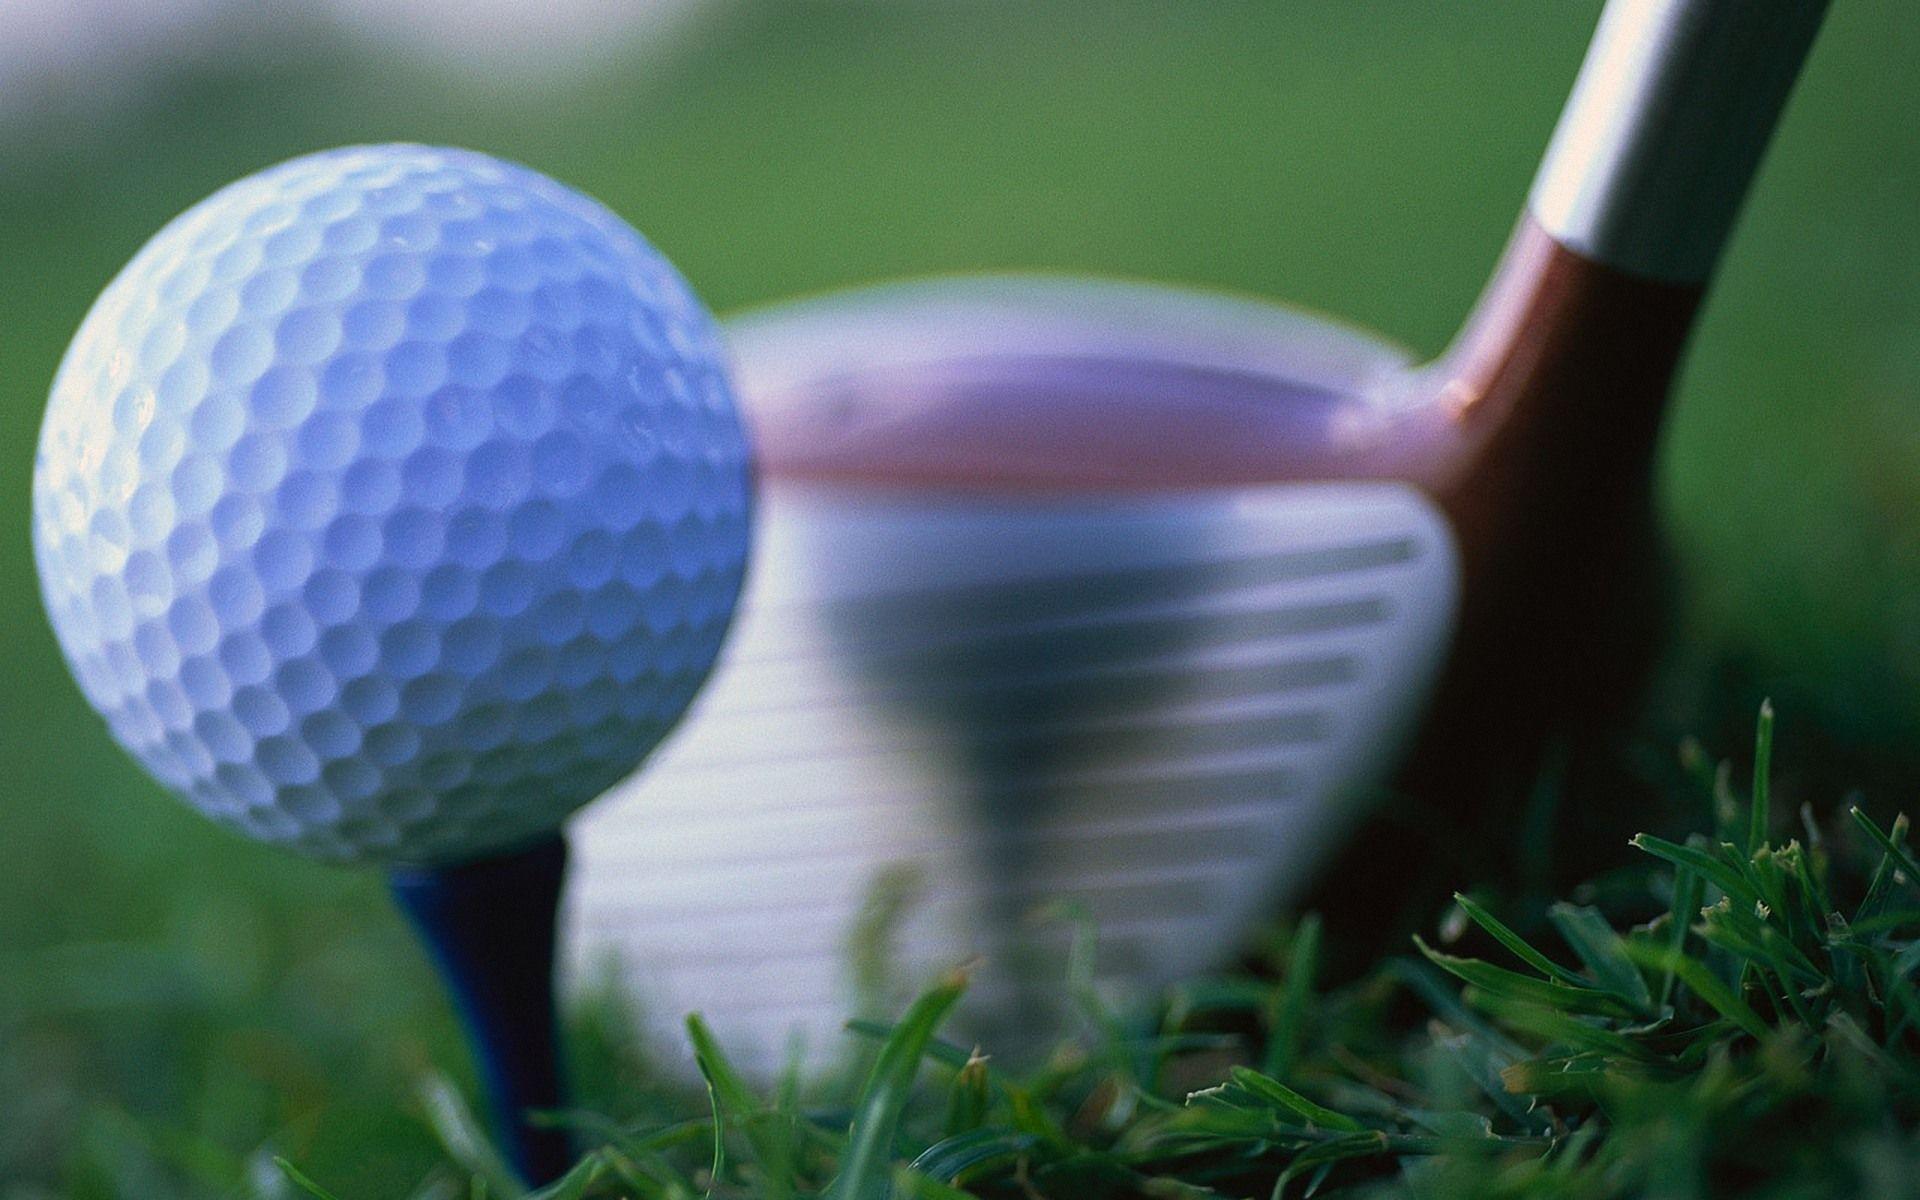 free golf photos